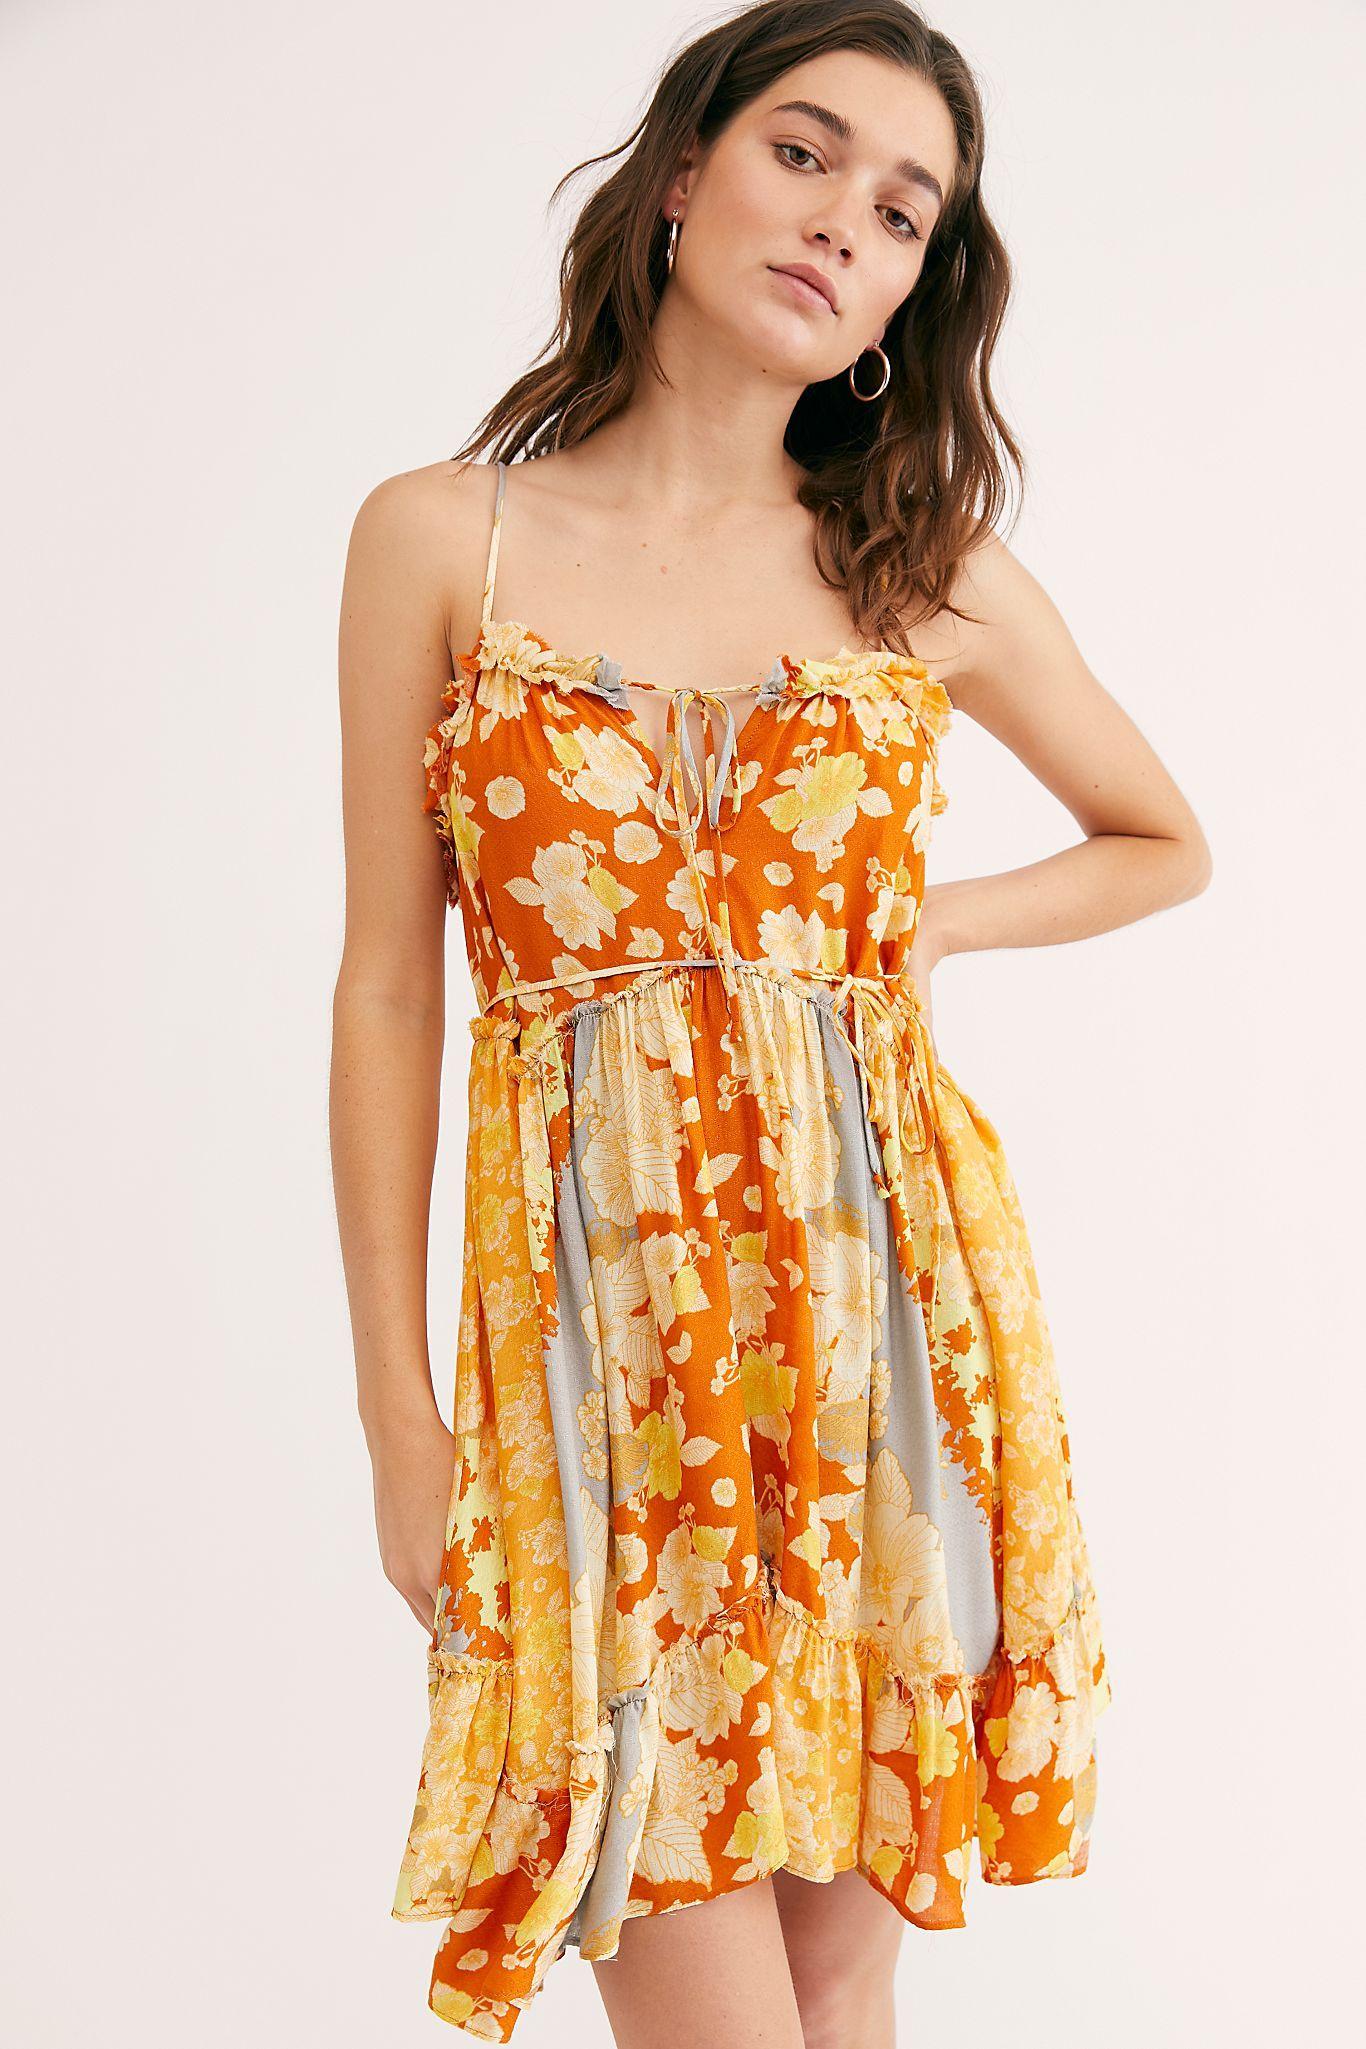 Summer Storm Slip Free People Floral Slip Dress Fashion Mini Dresses Summer [ 2049 x 1366 Pixel ]